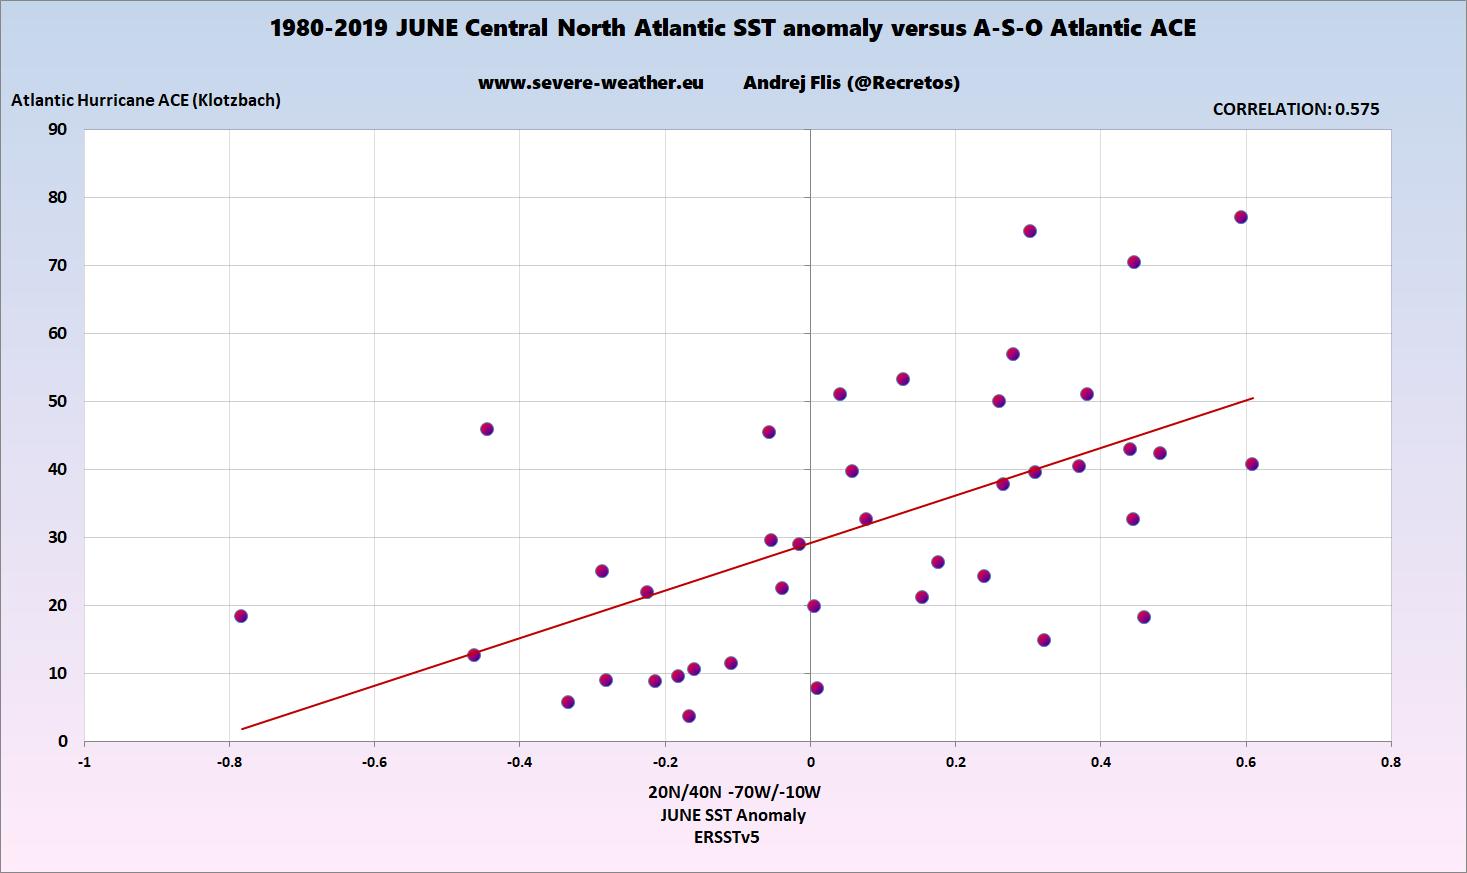 atlantic-ocean-june-summer-effect-on-hurricane-season-graph